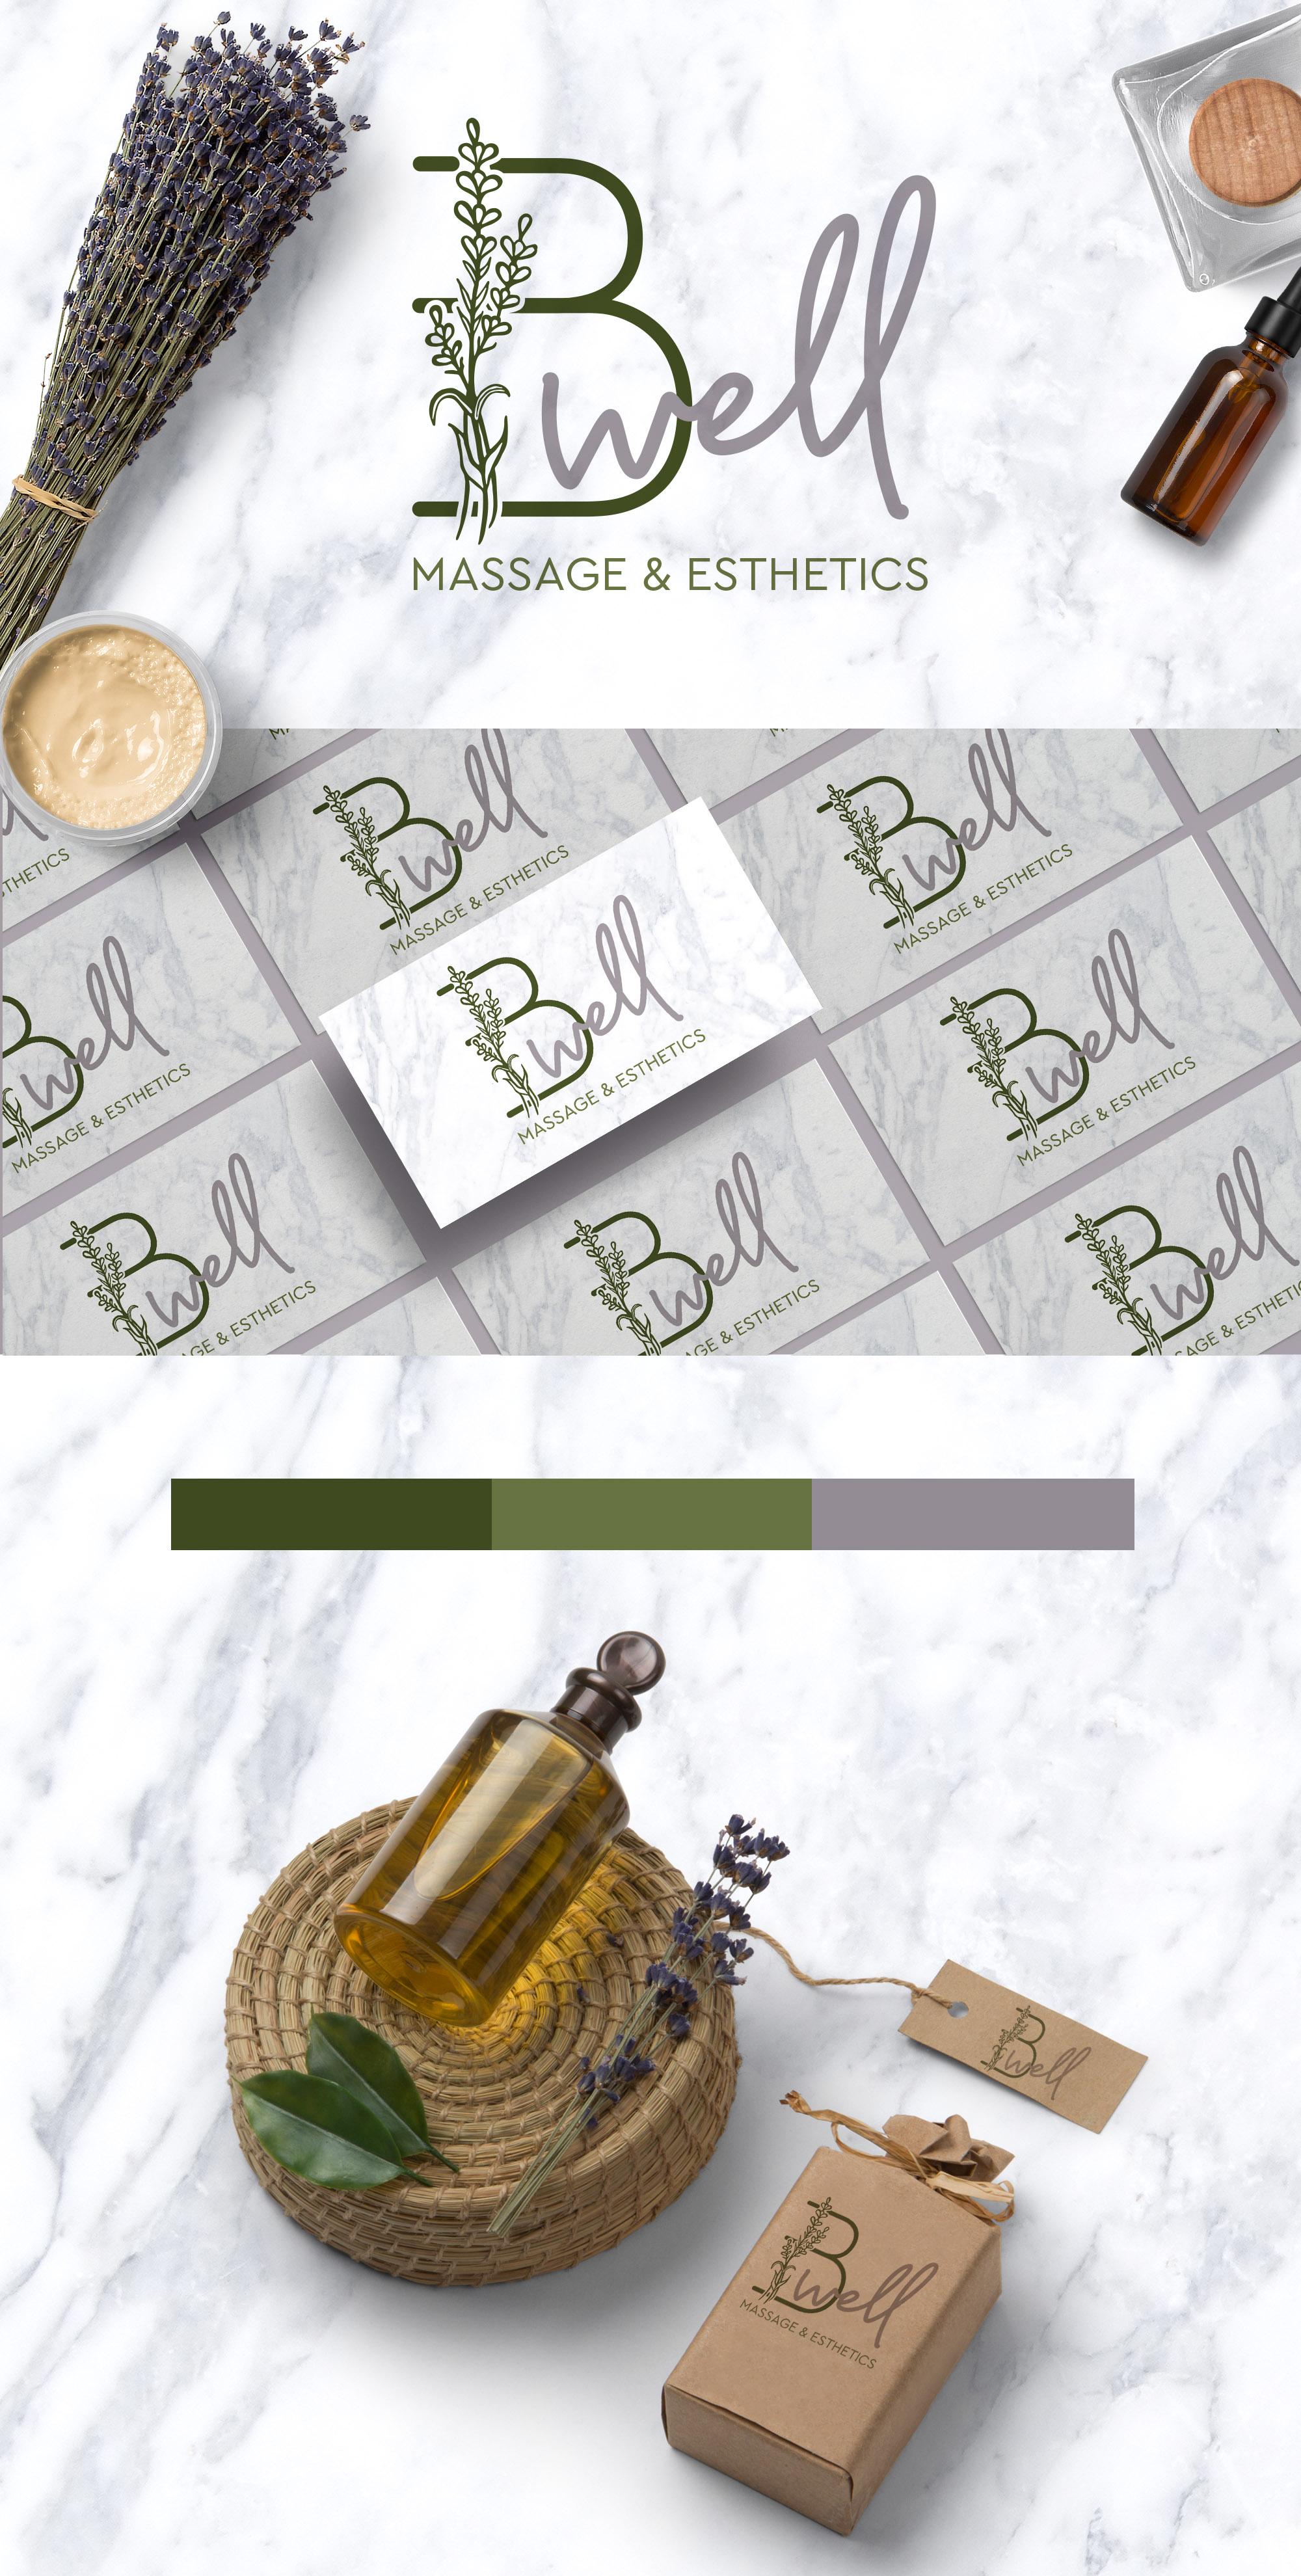 EyeSavvy-Design-BWell-LongPost.jpg